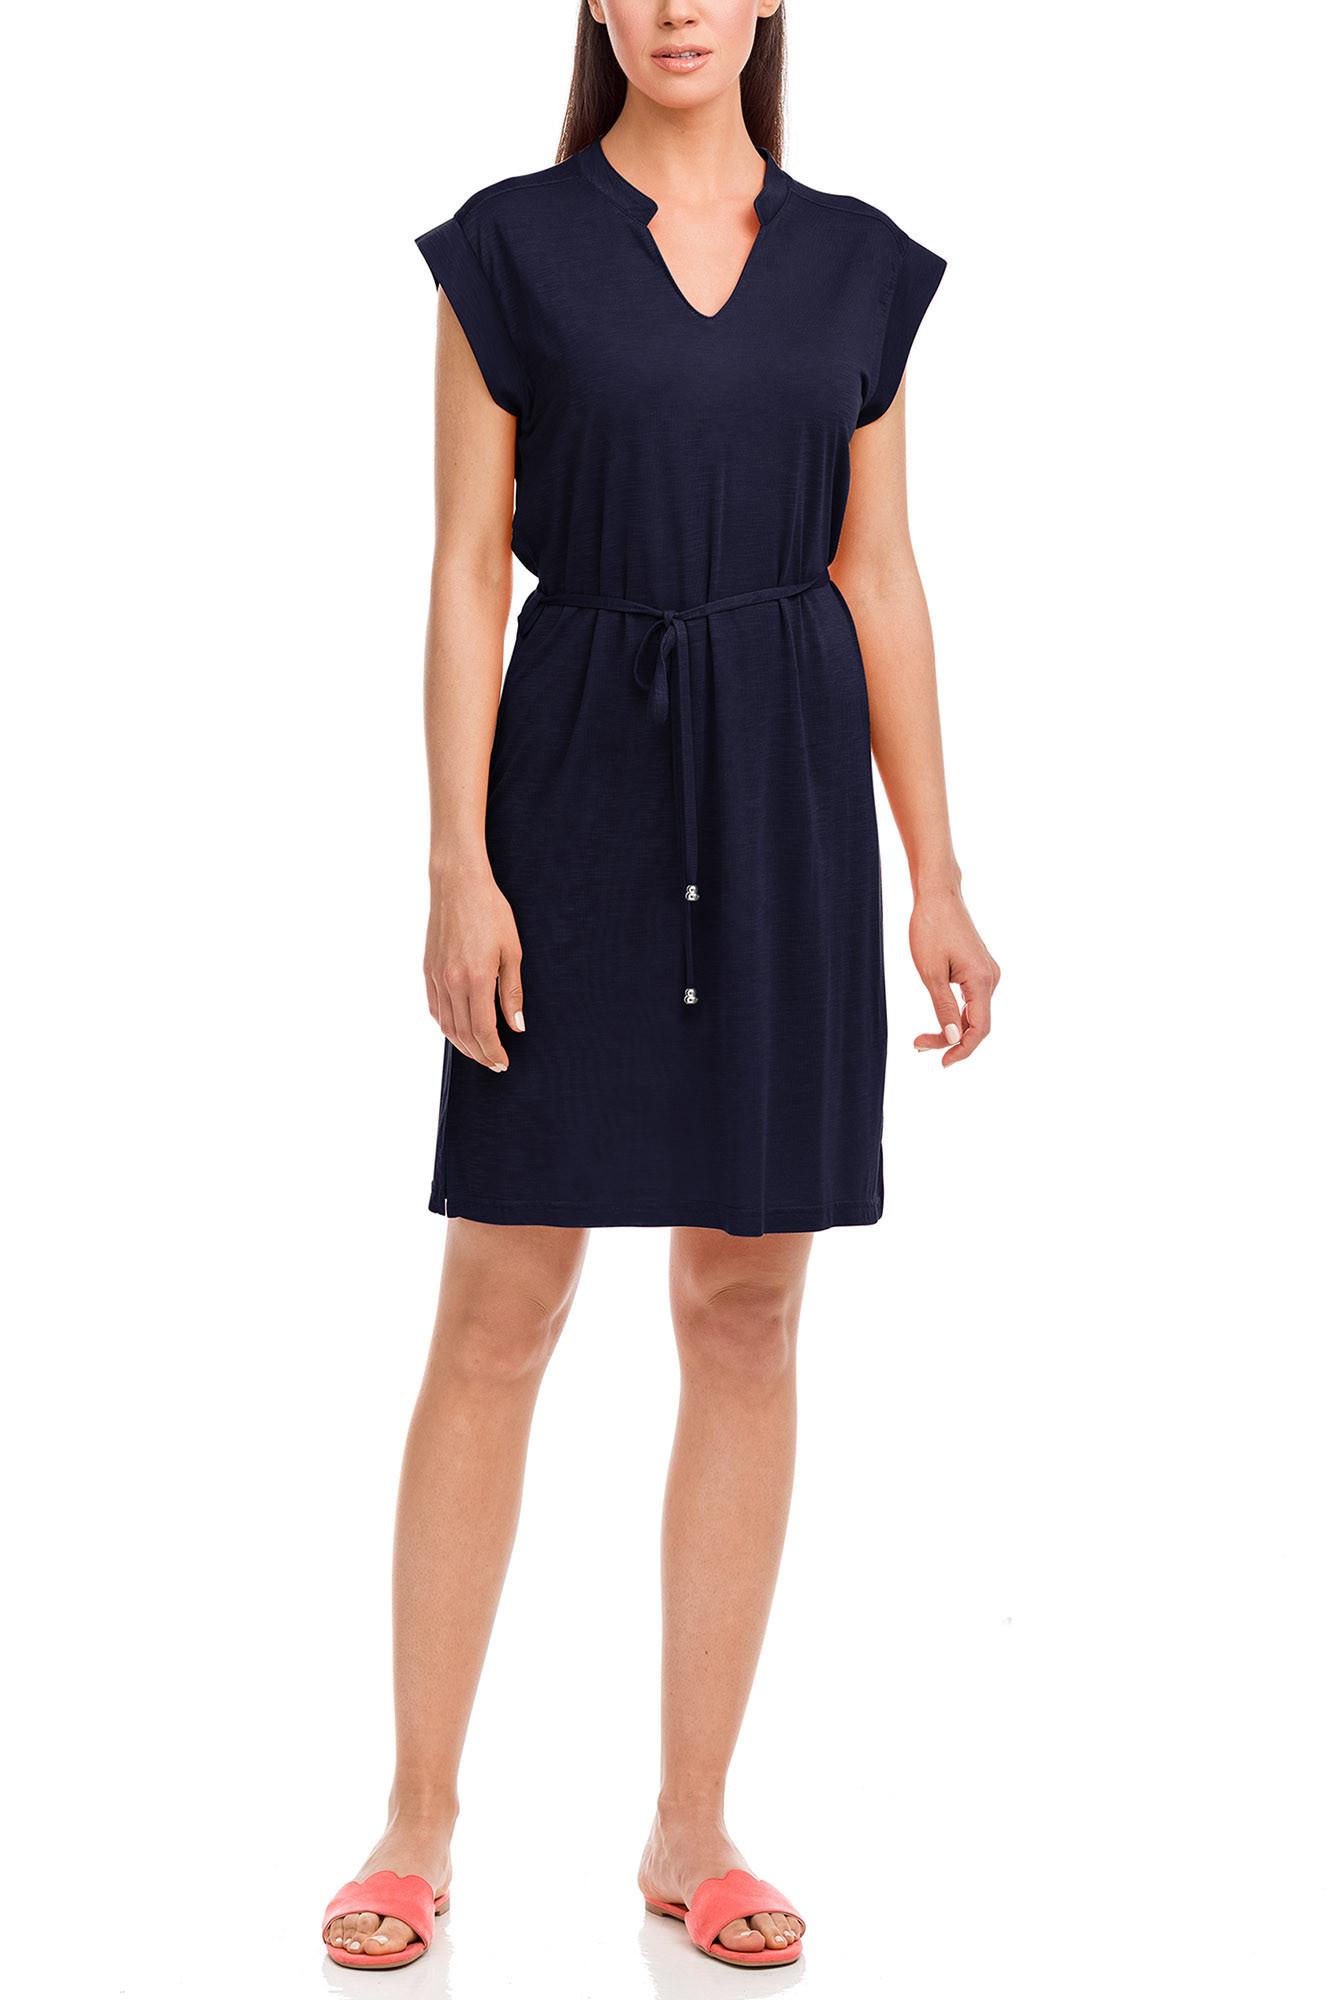 Vamp - Dámske šaty 12590 - Vamp Modrá l